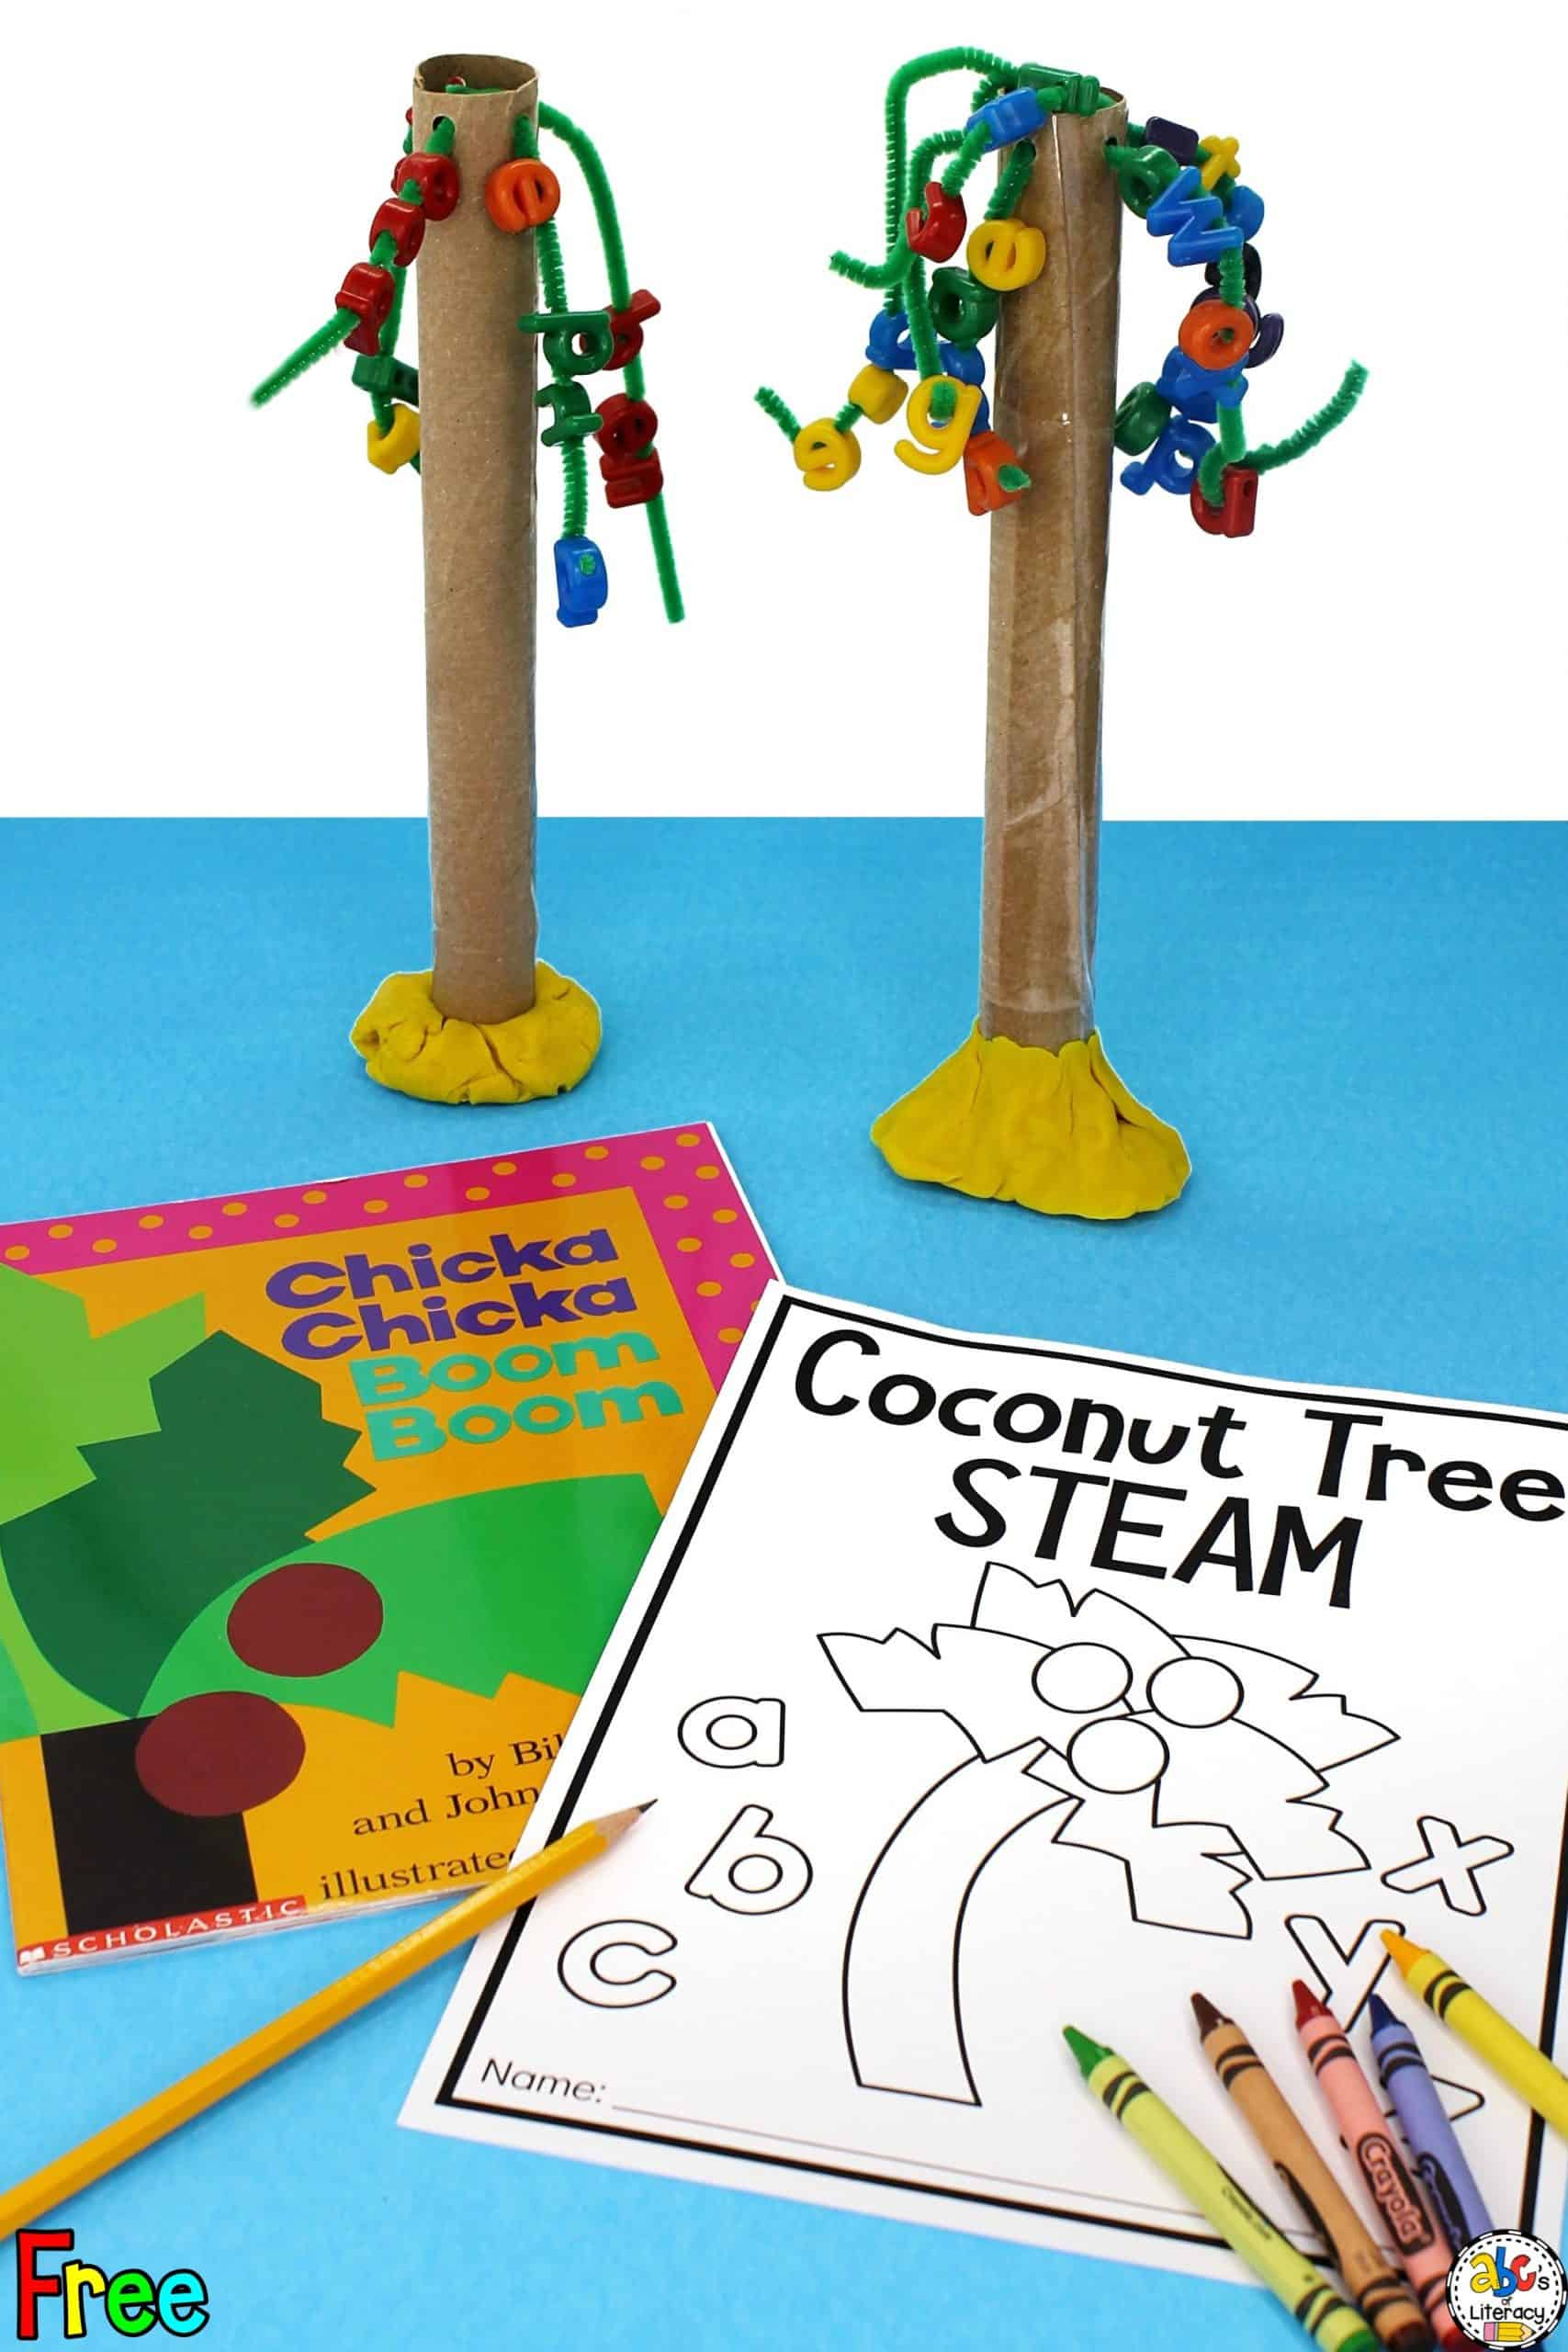 Coconut Tree STEAM Activity